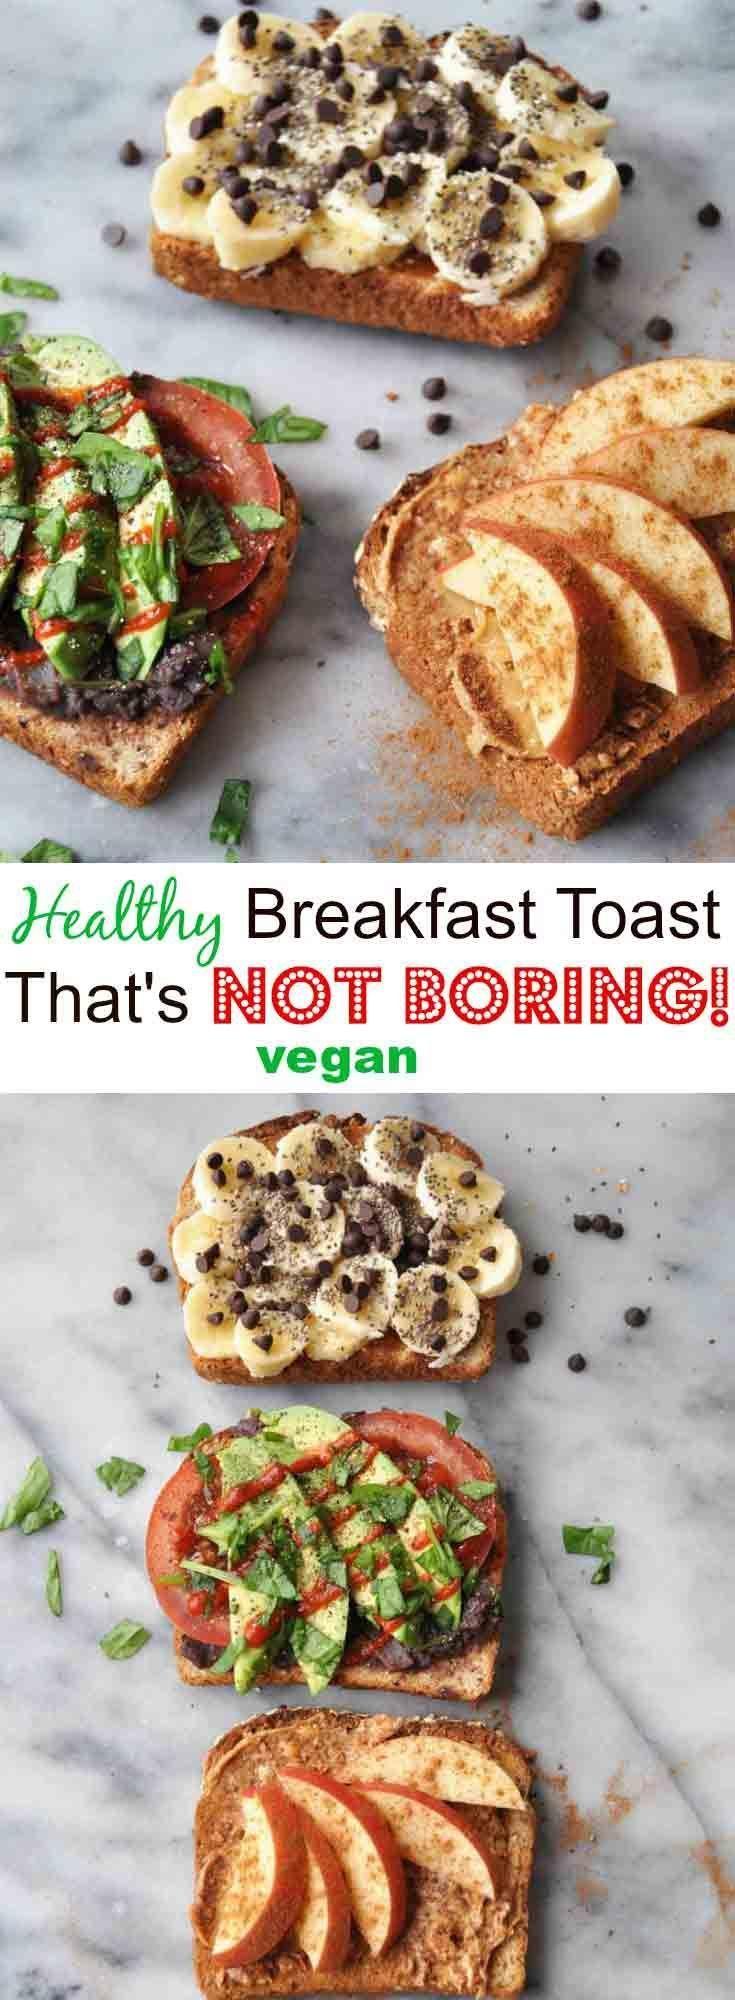 Simple healthy vegan breakfast toast that isn't boring